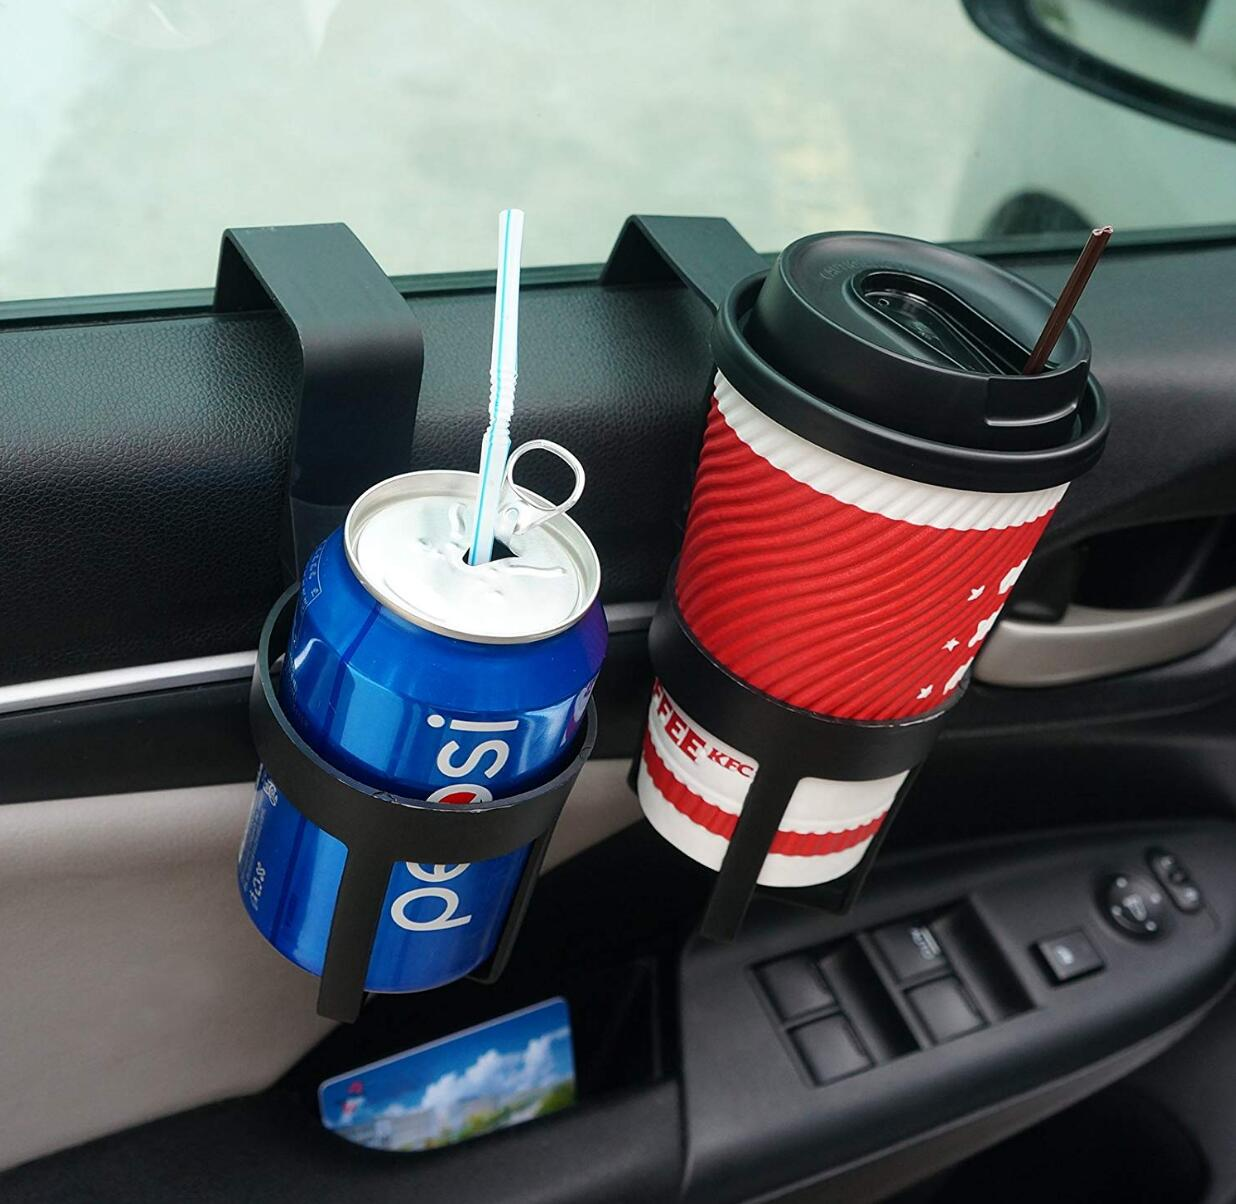 Car Drinks Cup Bottle Can Mount Holder Stand for sandero stepway bmw 320 toyota allion peugeot 508 kia cerato grande punto